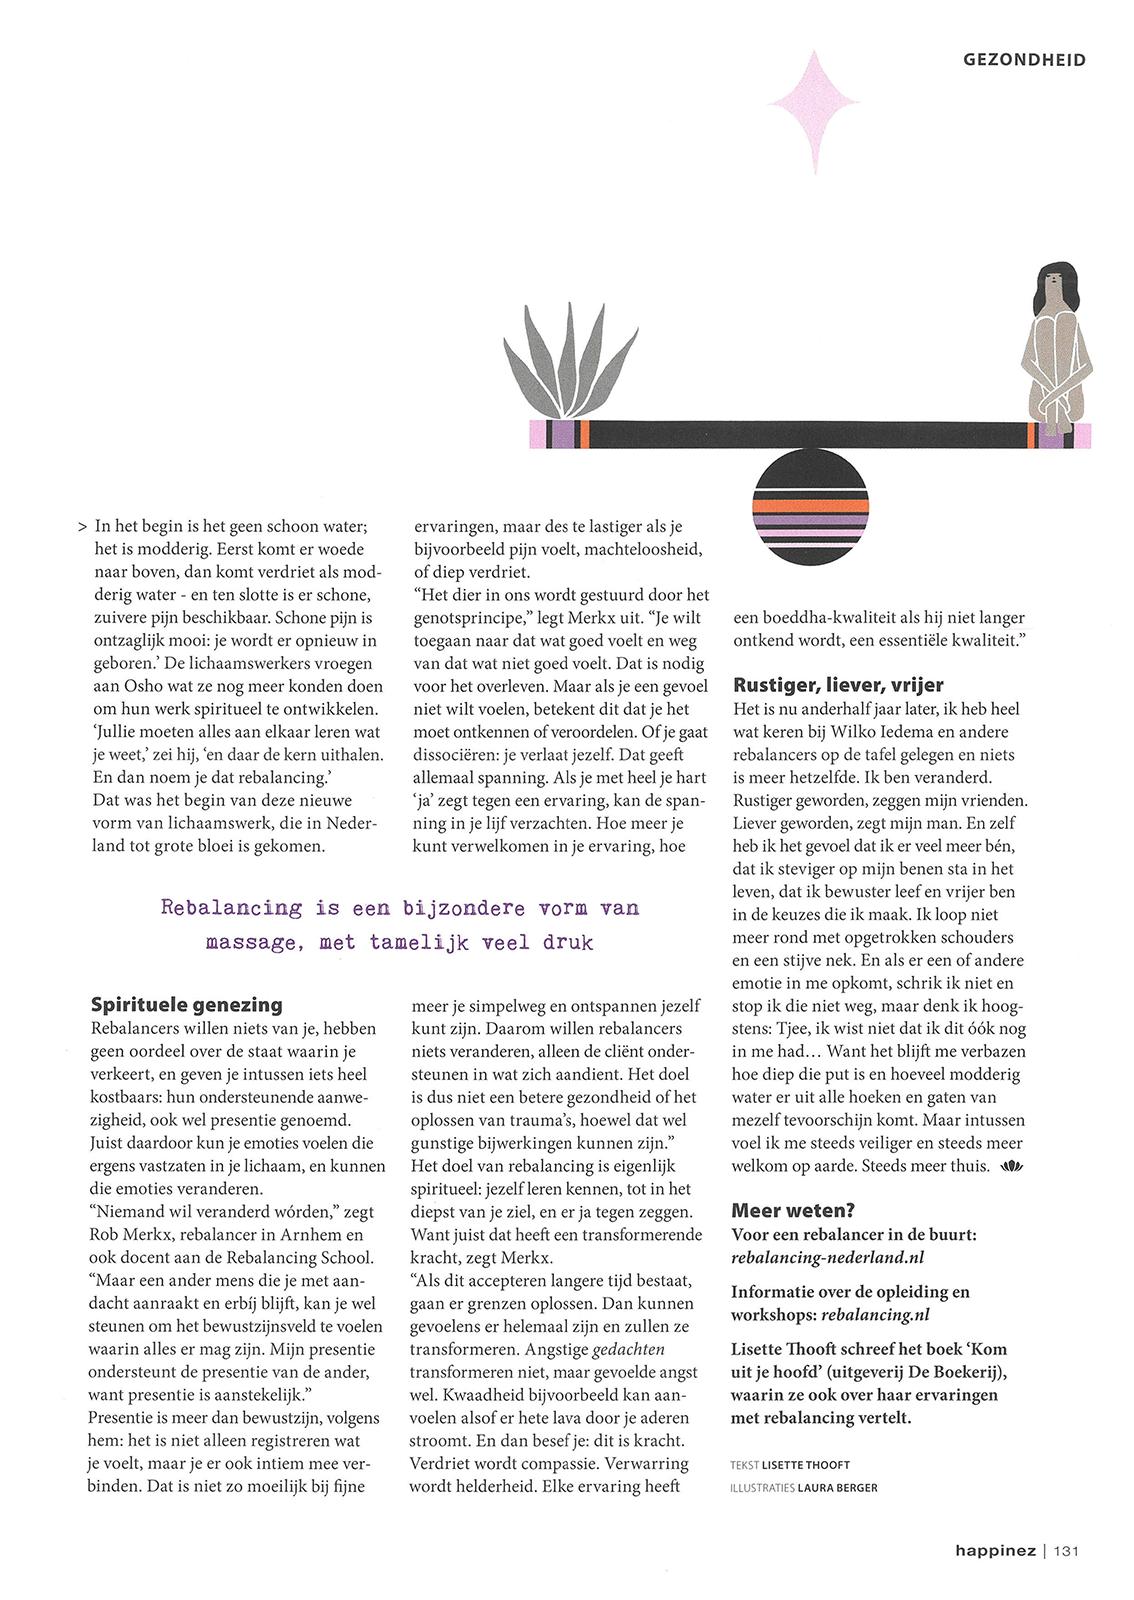 Rebalancing-artikel-Happinez-okt-2016-4.png